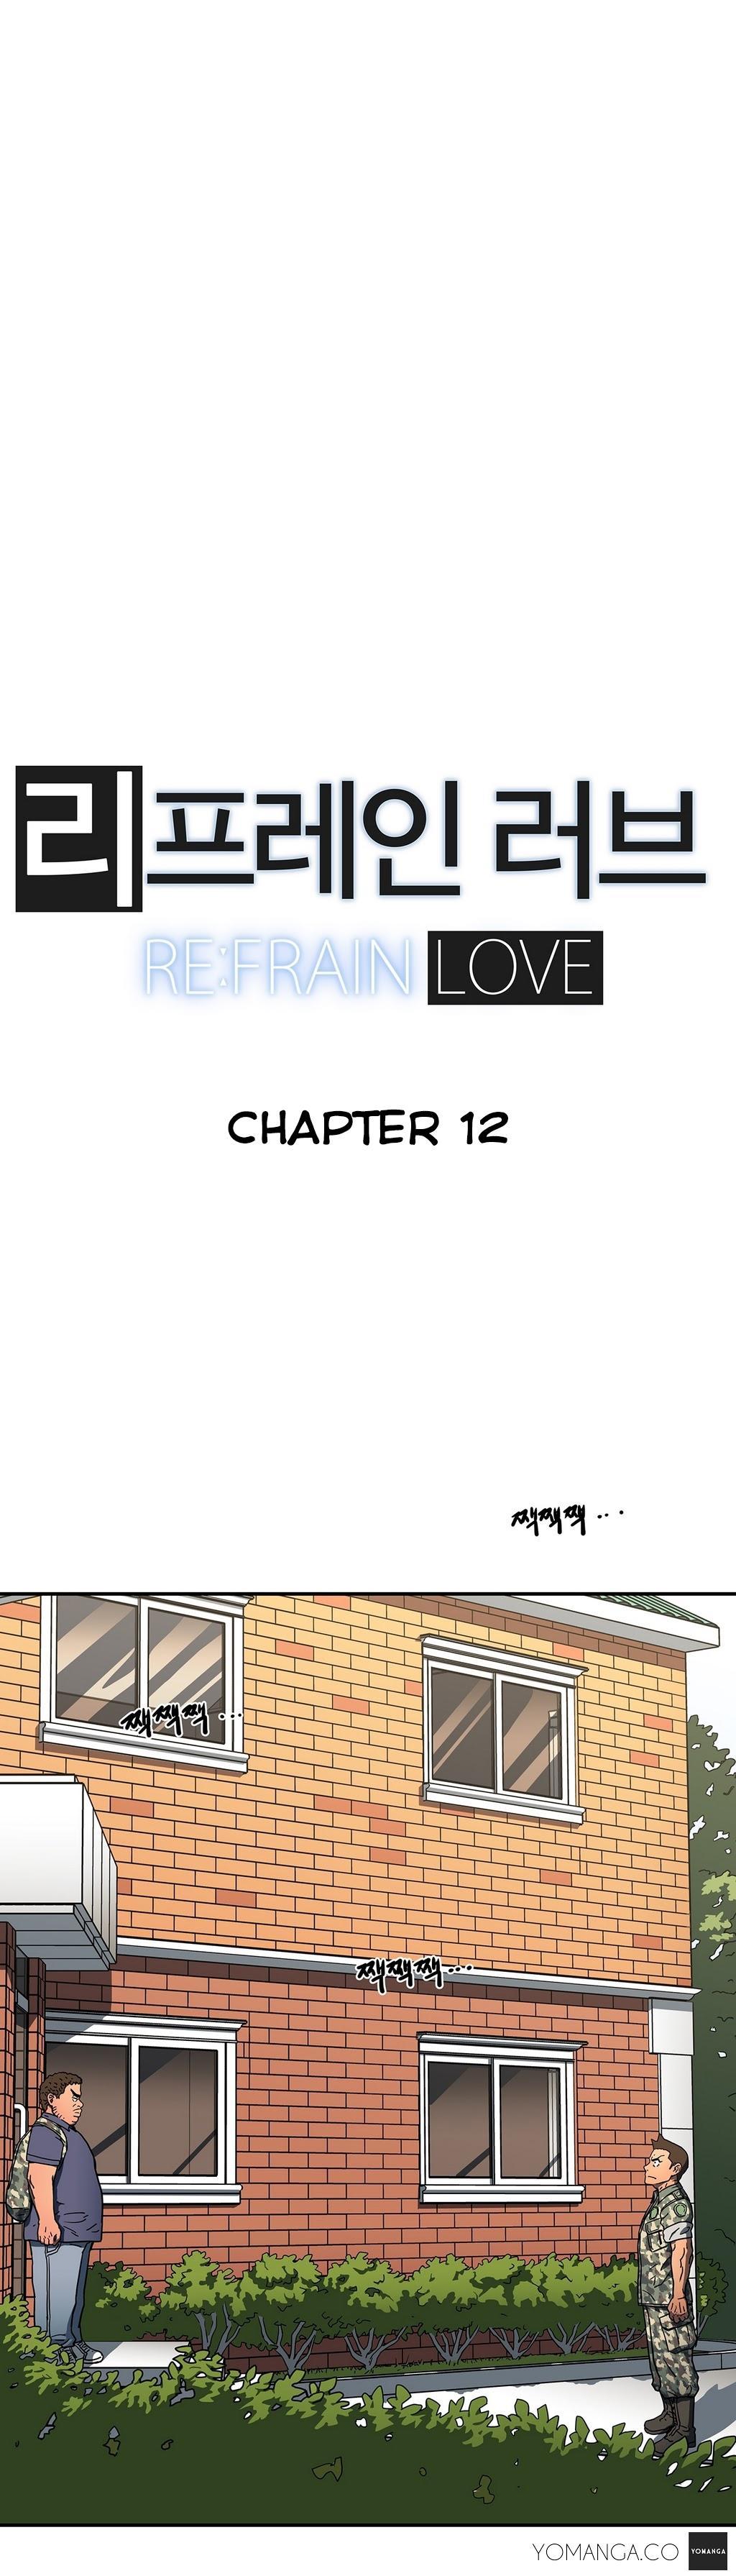 Refrain Love Ch.1-23 292